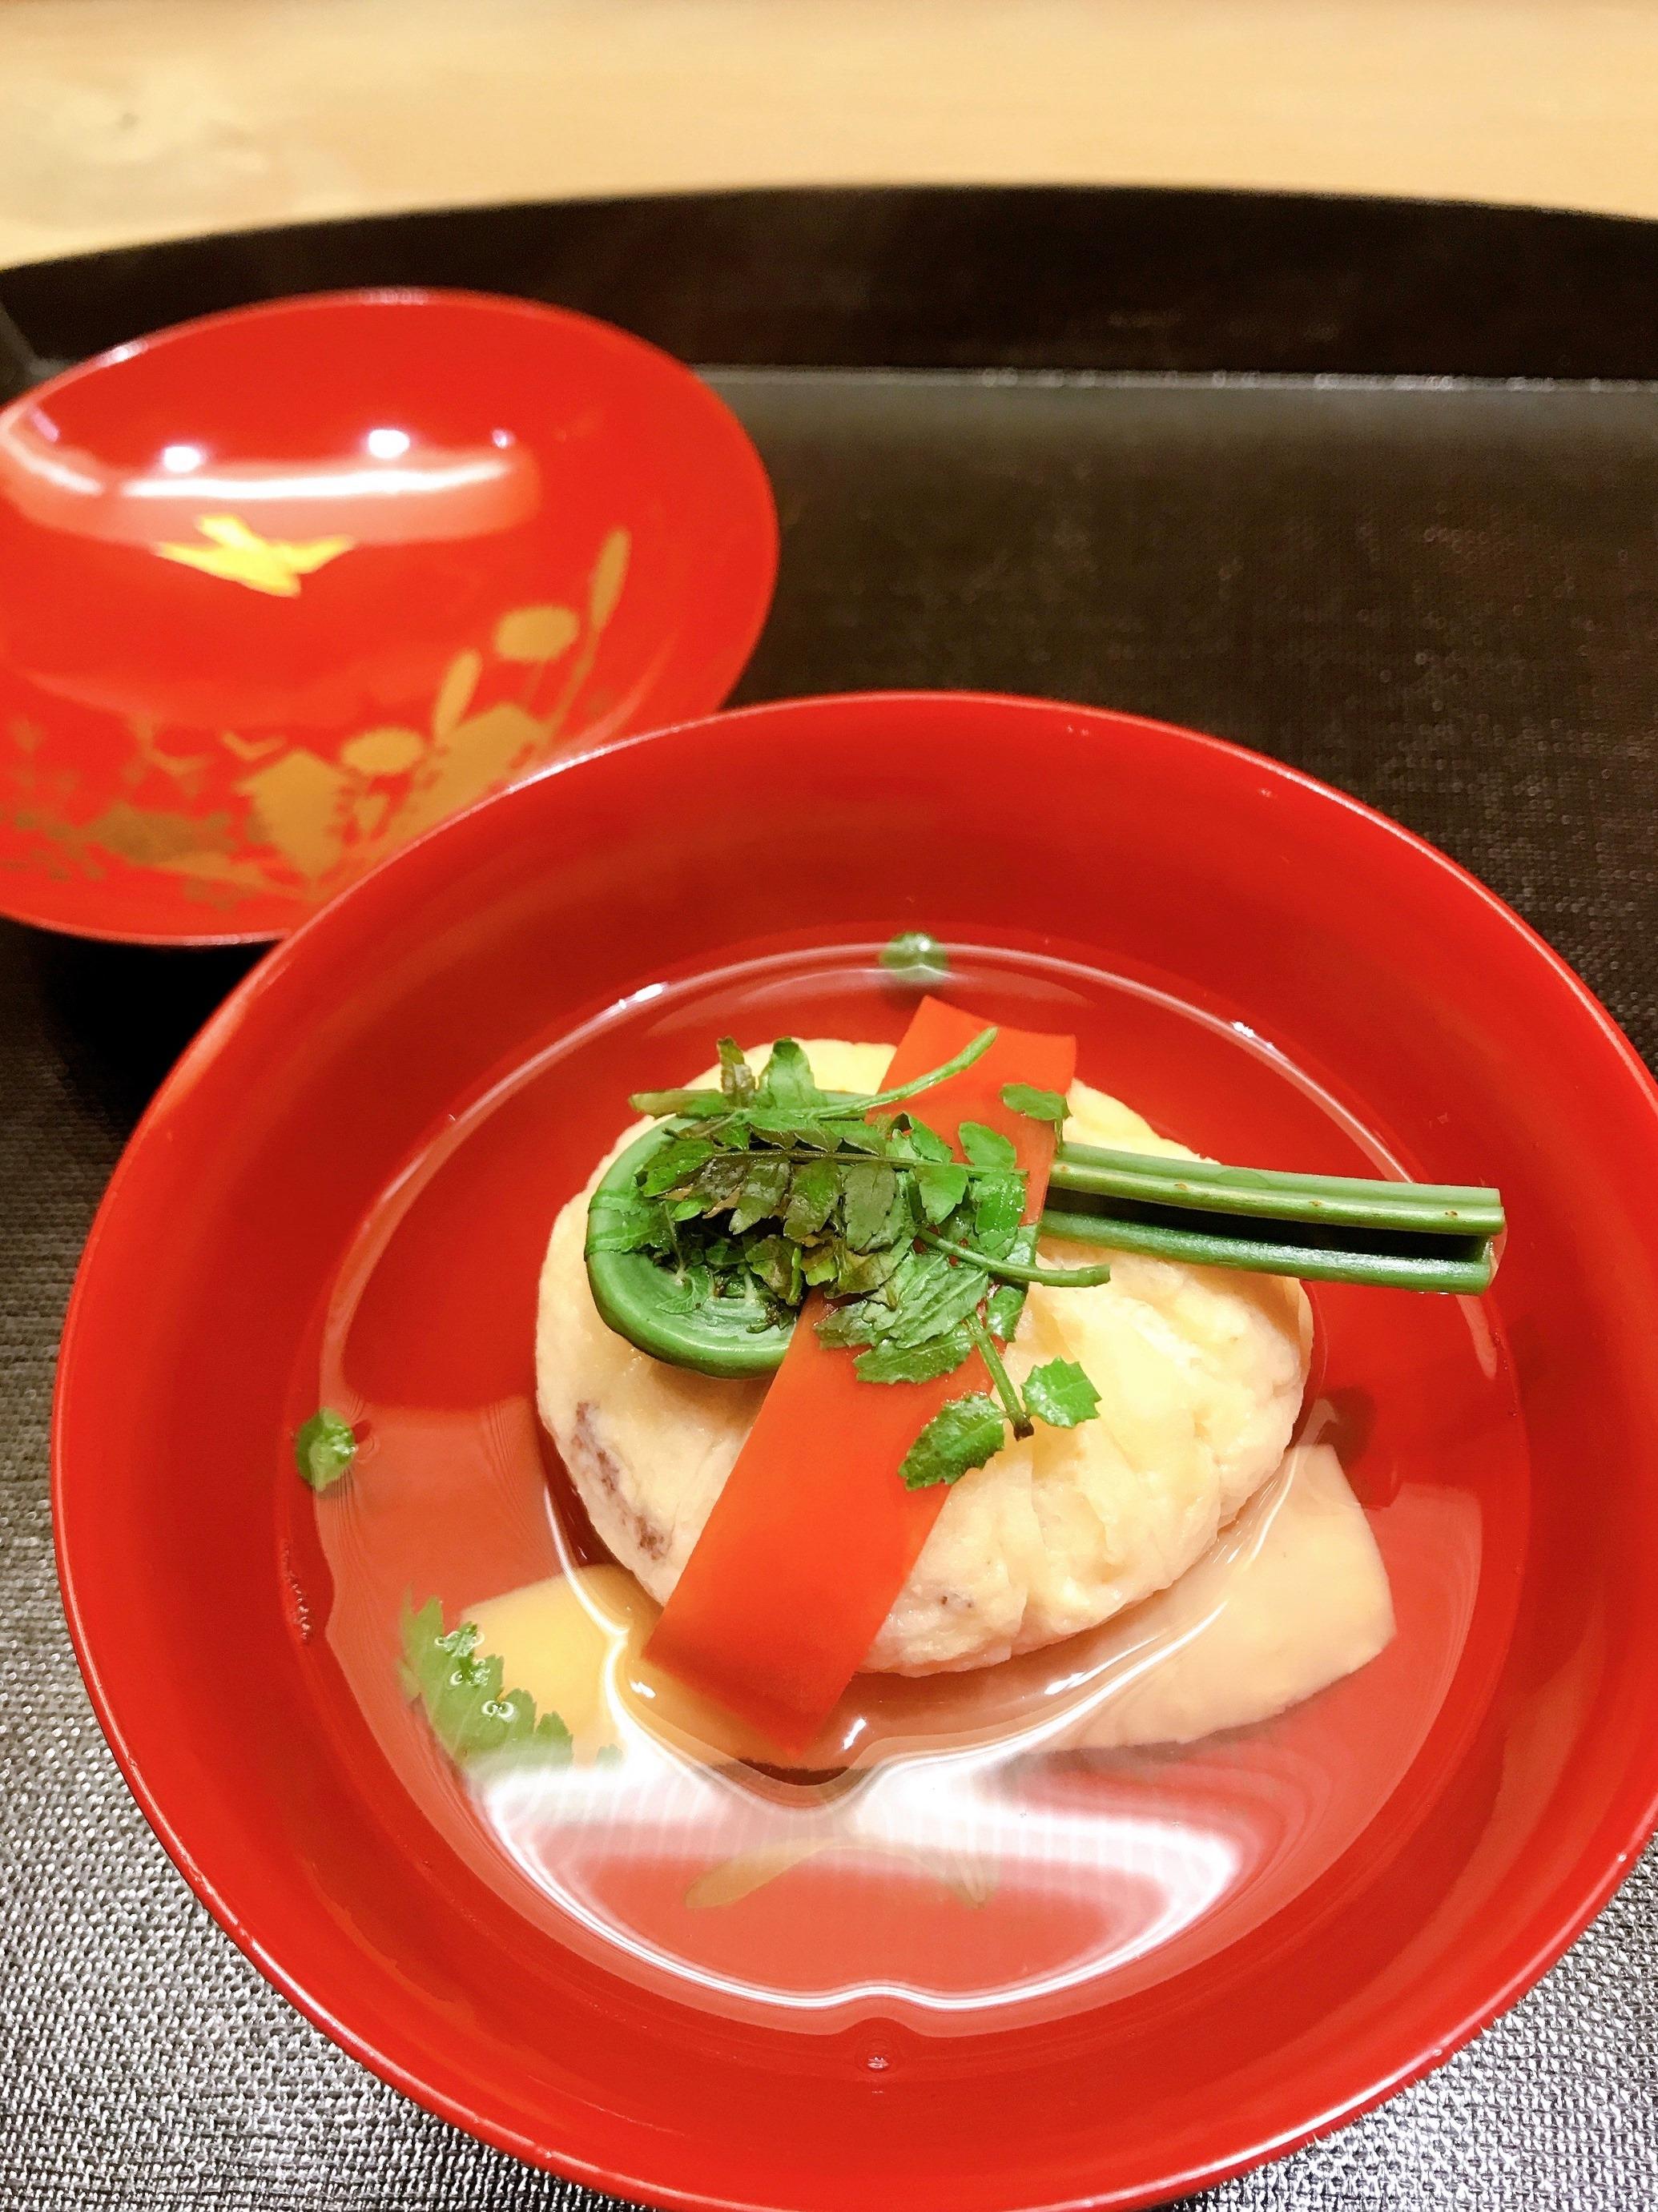 A bowl of carefully prepared soup at Yokoyama in Kanazawa, Japan